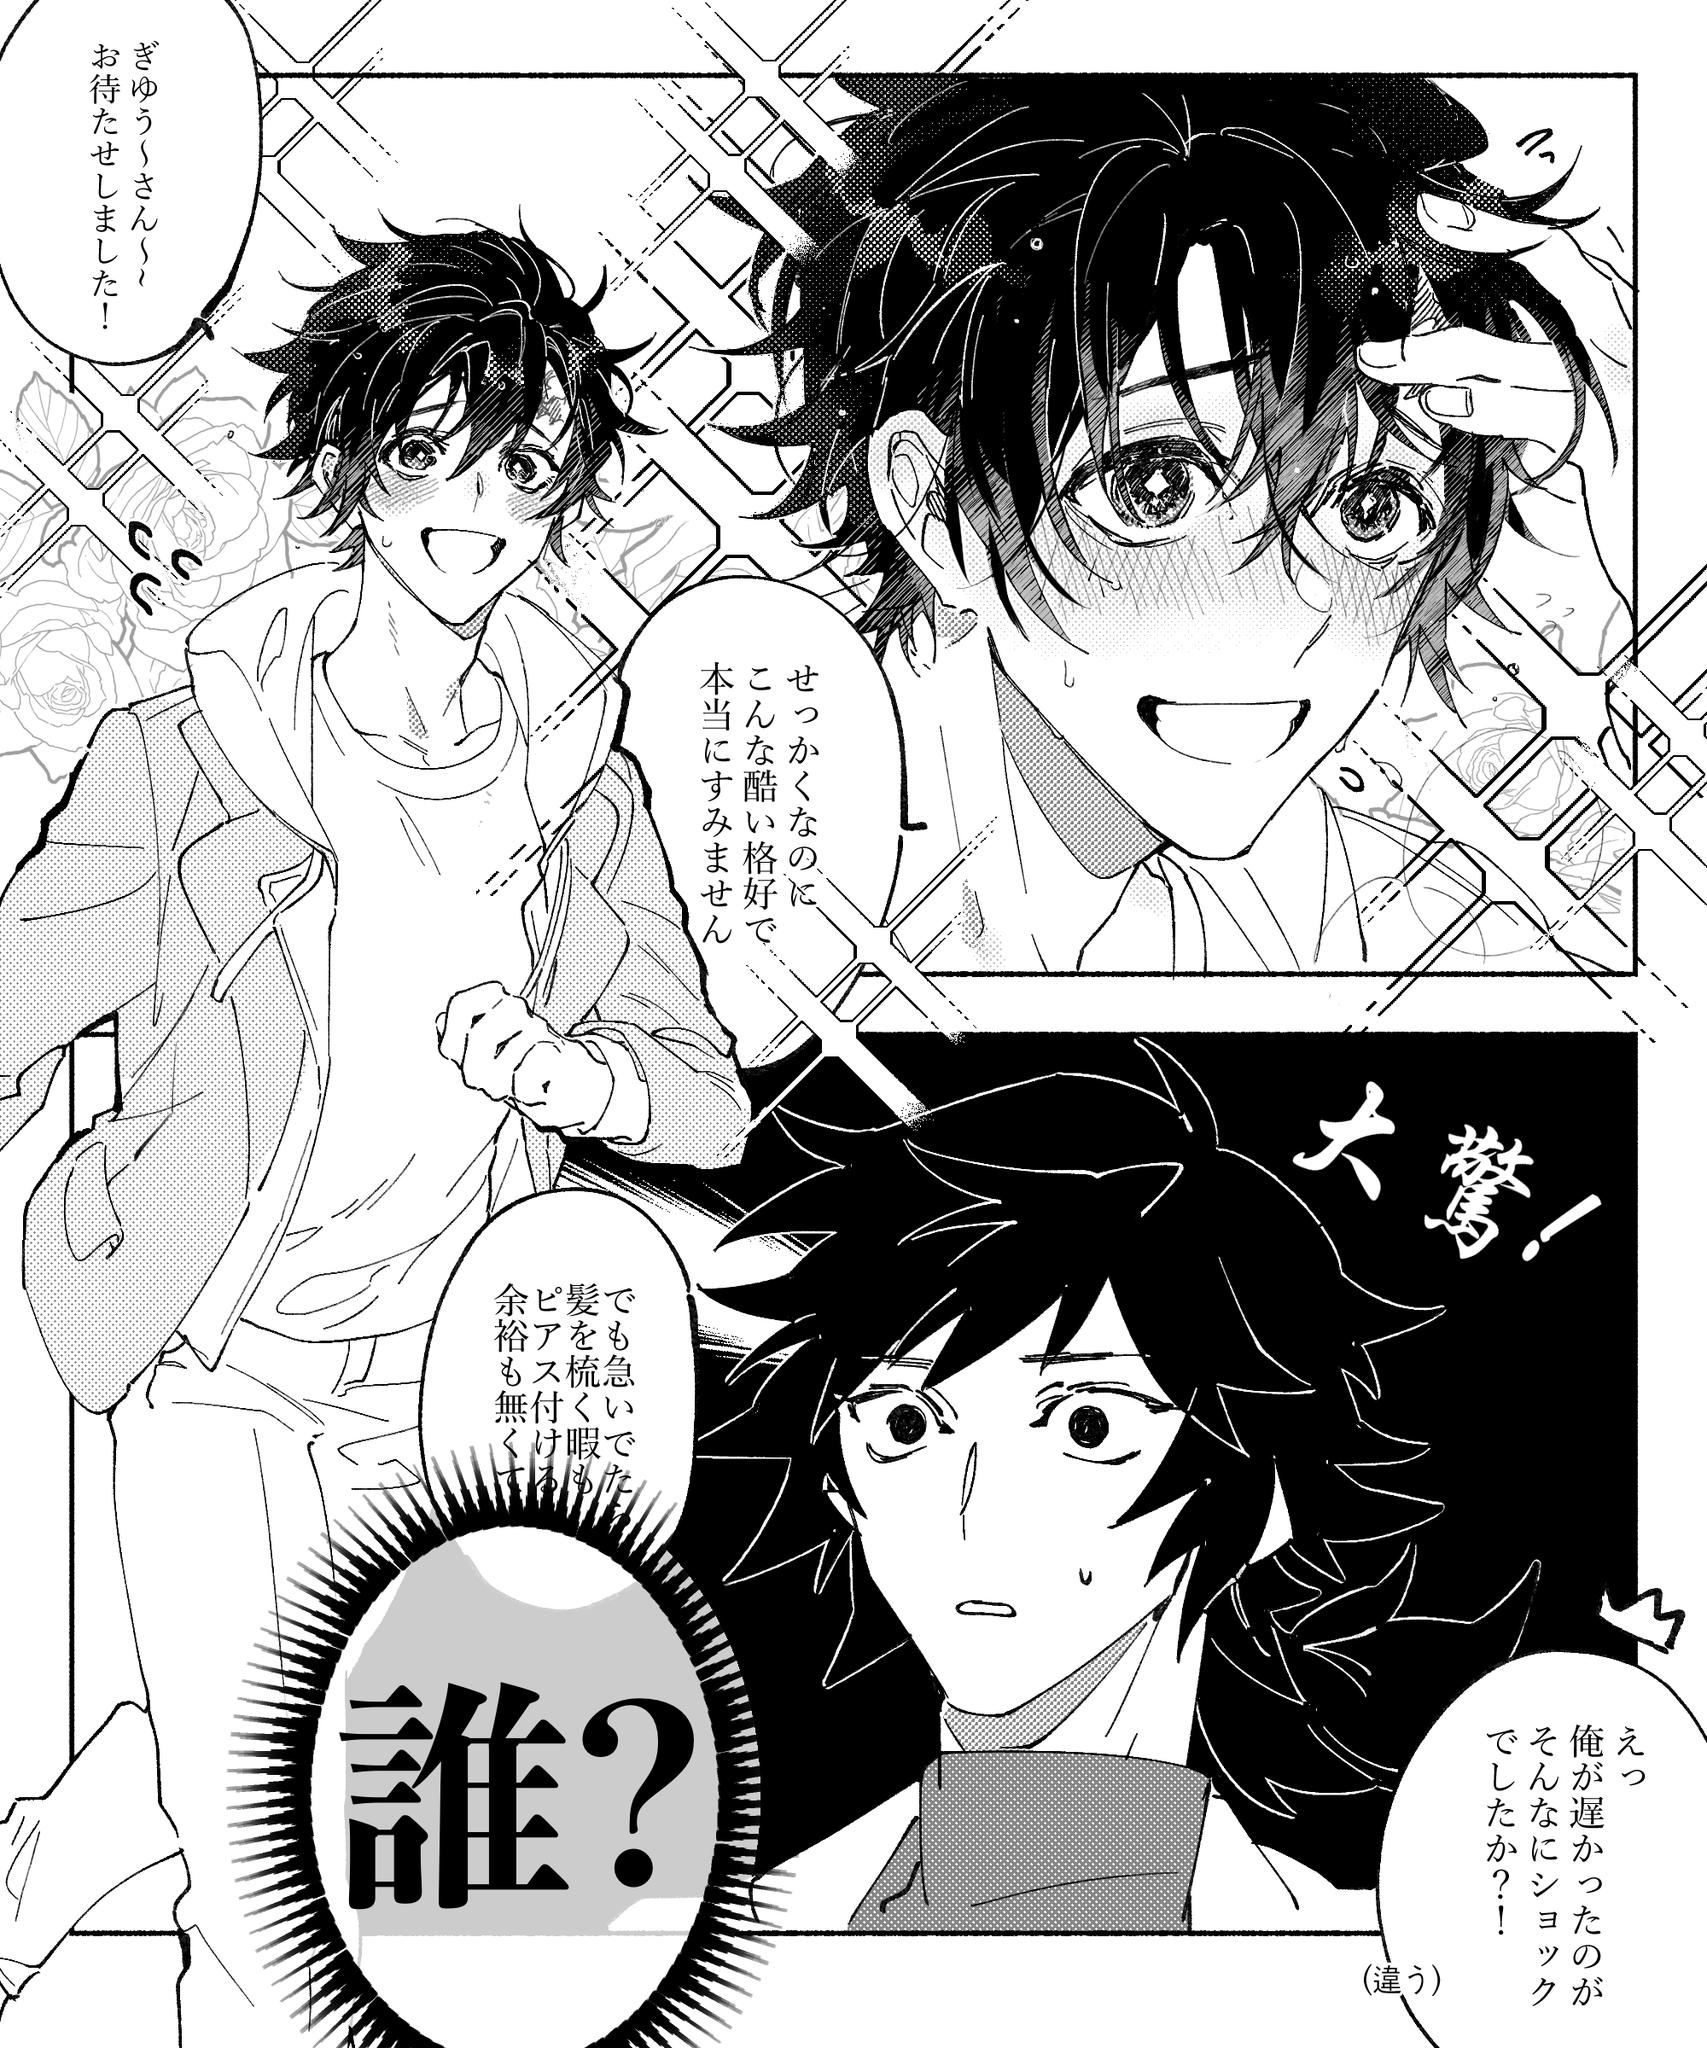 twitter 画 漫画 アニメ